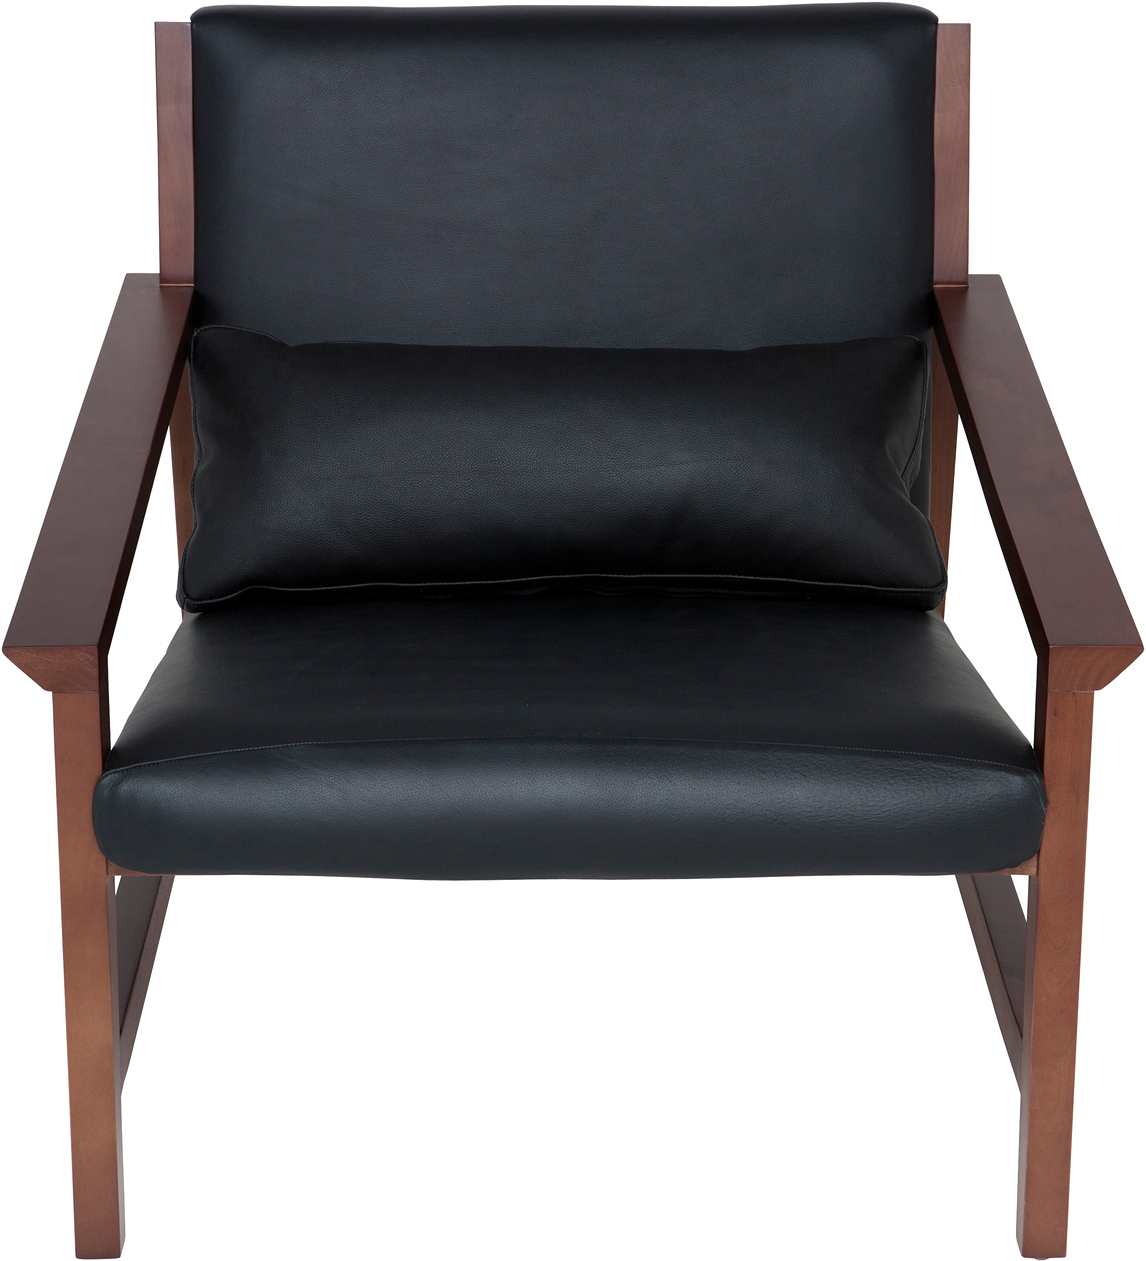 the nuevo bethany lounge chair